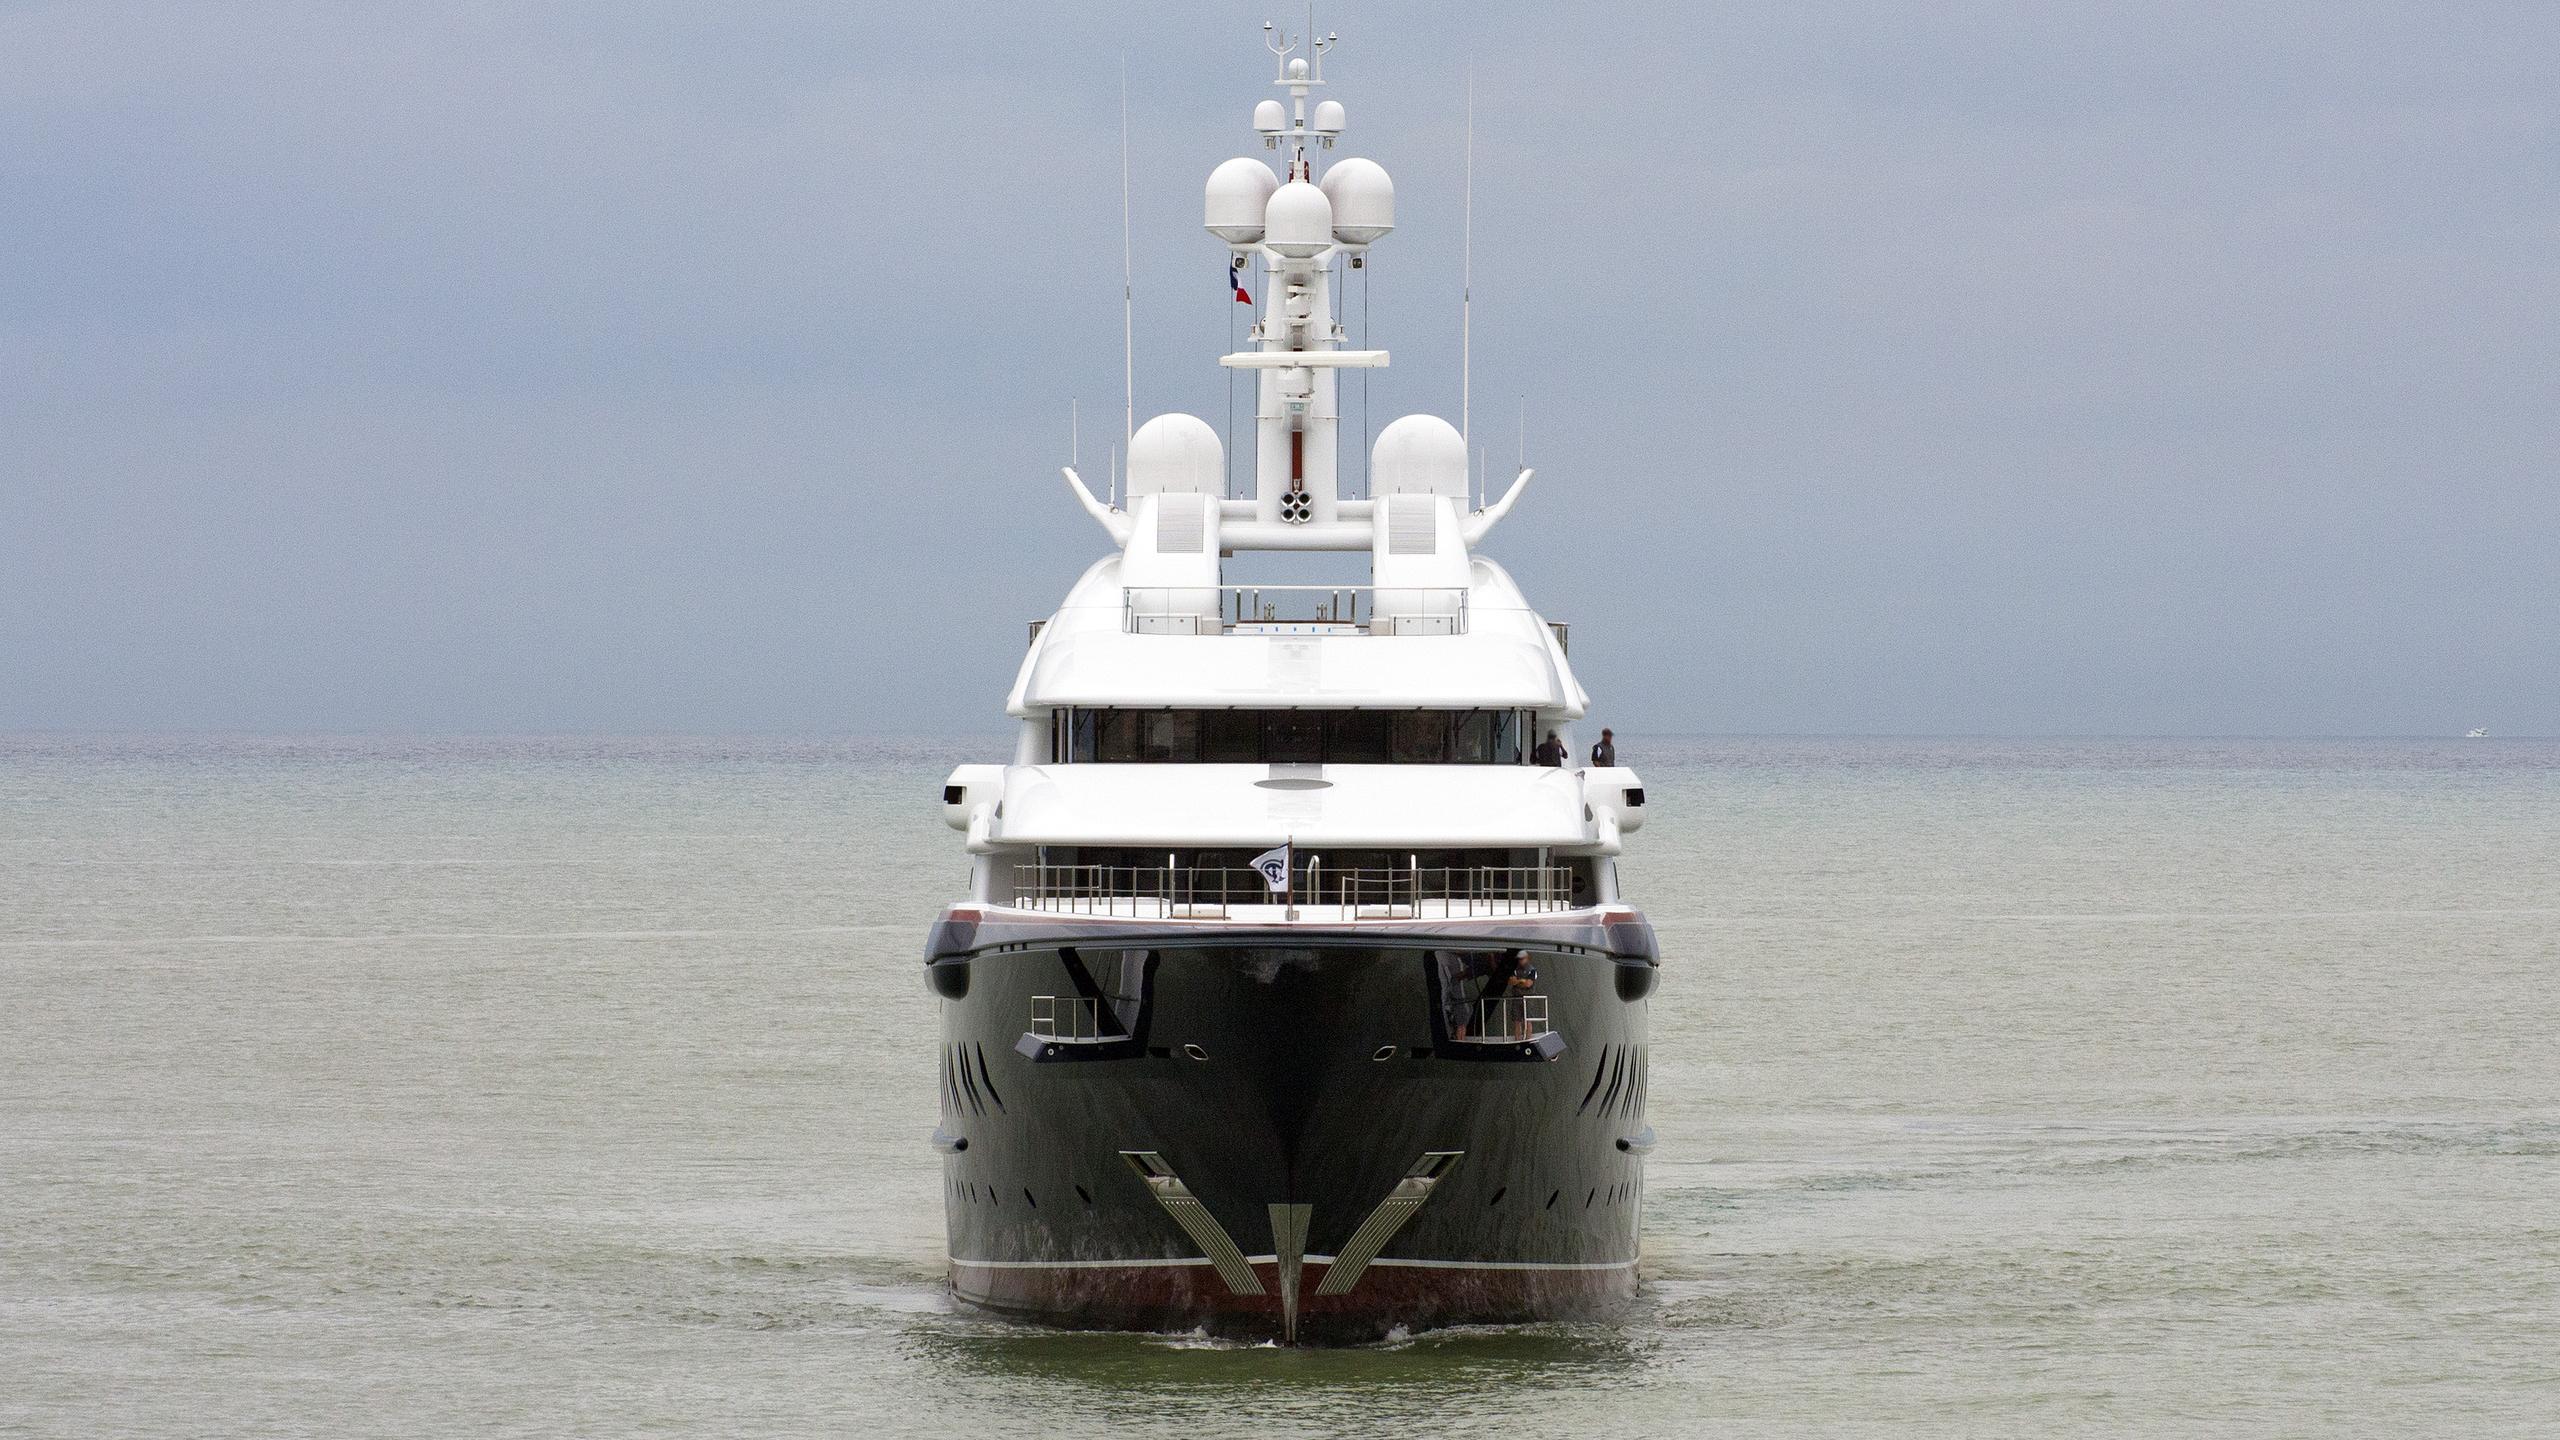 nirvana-motor-yacht-oceanco-2012-88m-bow